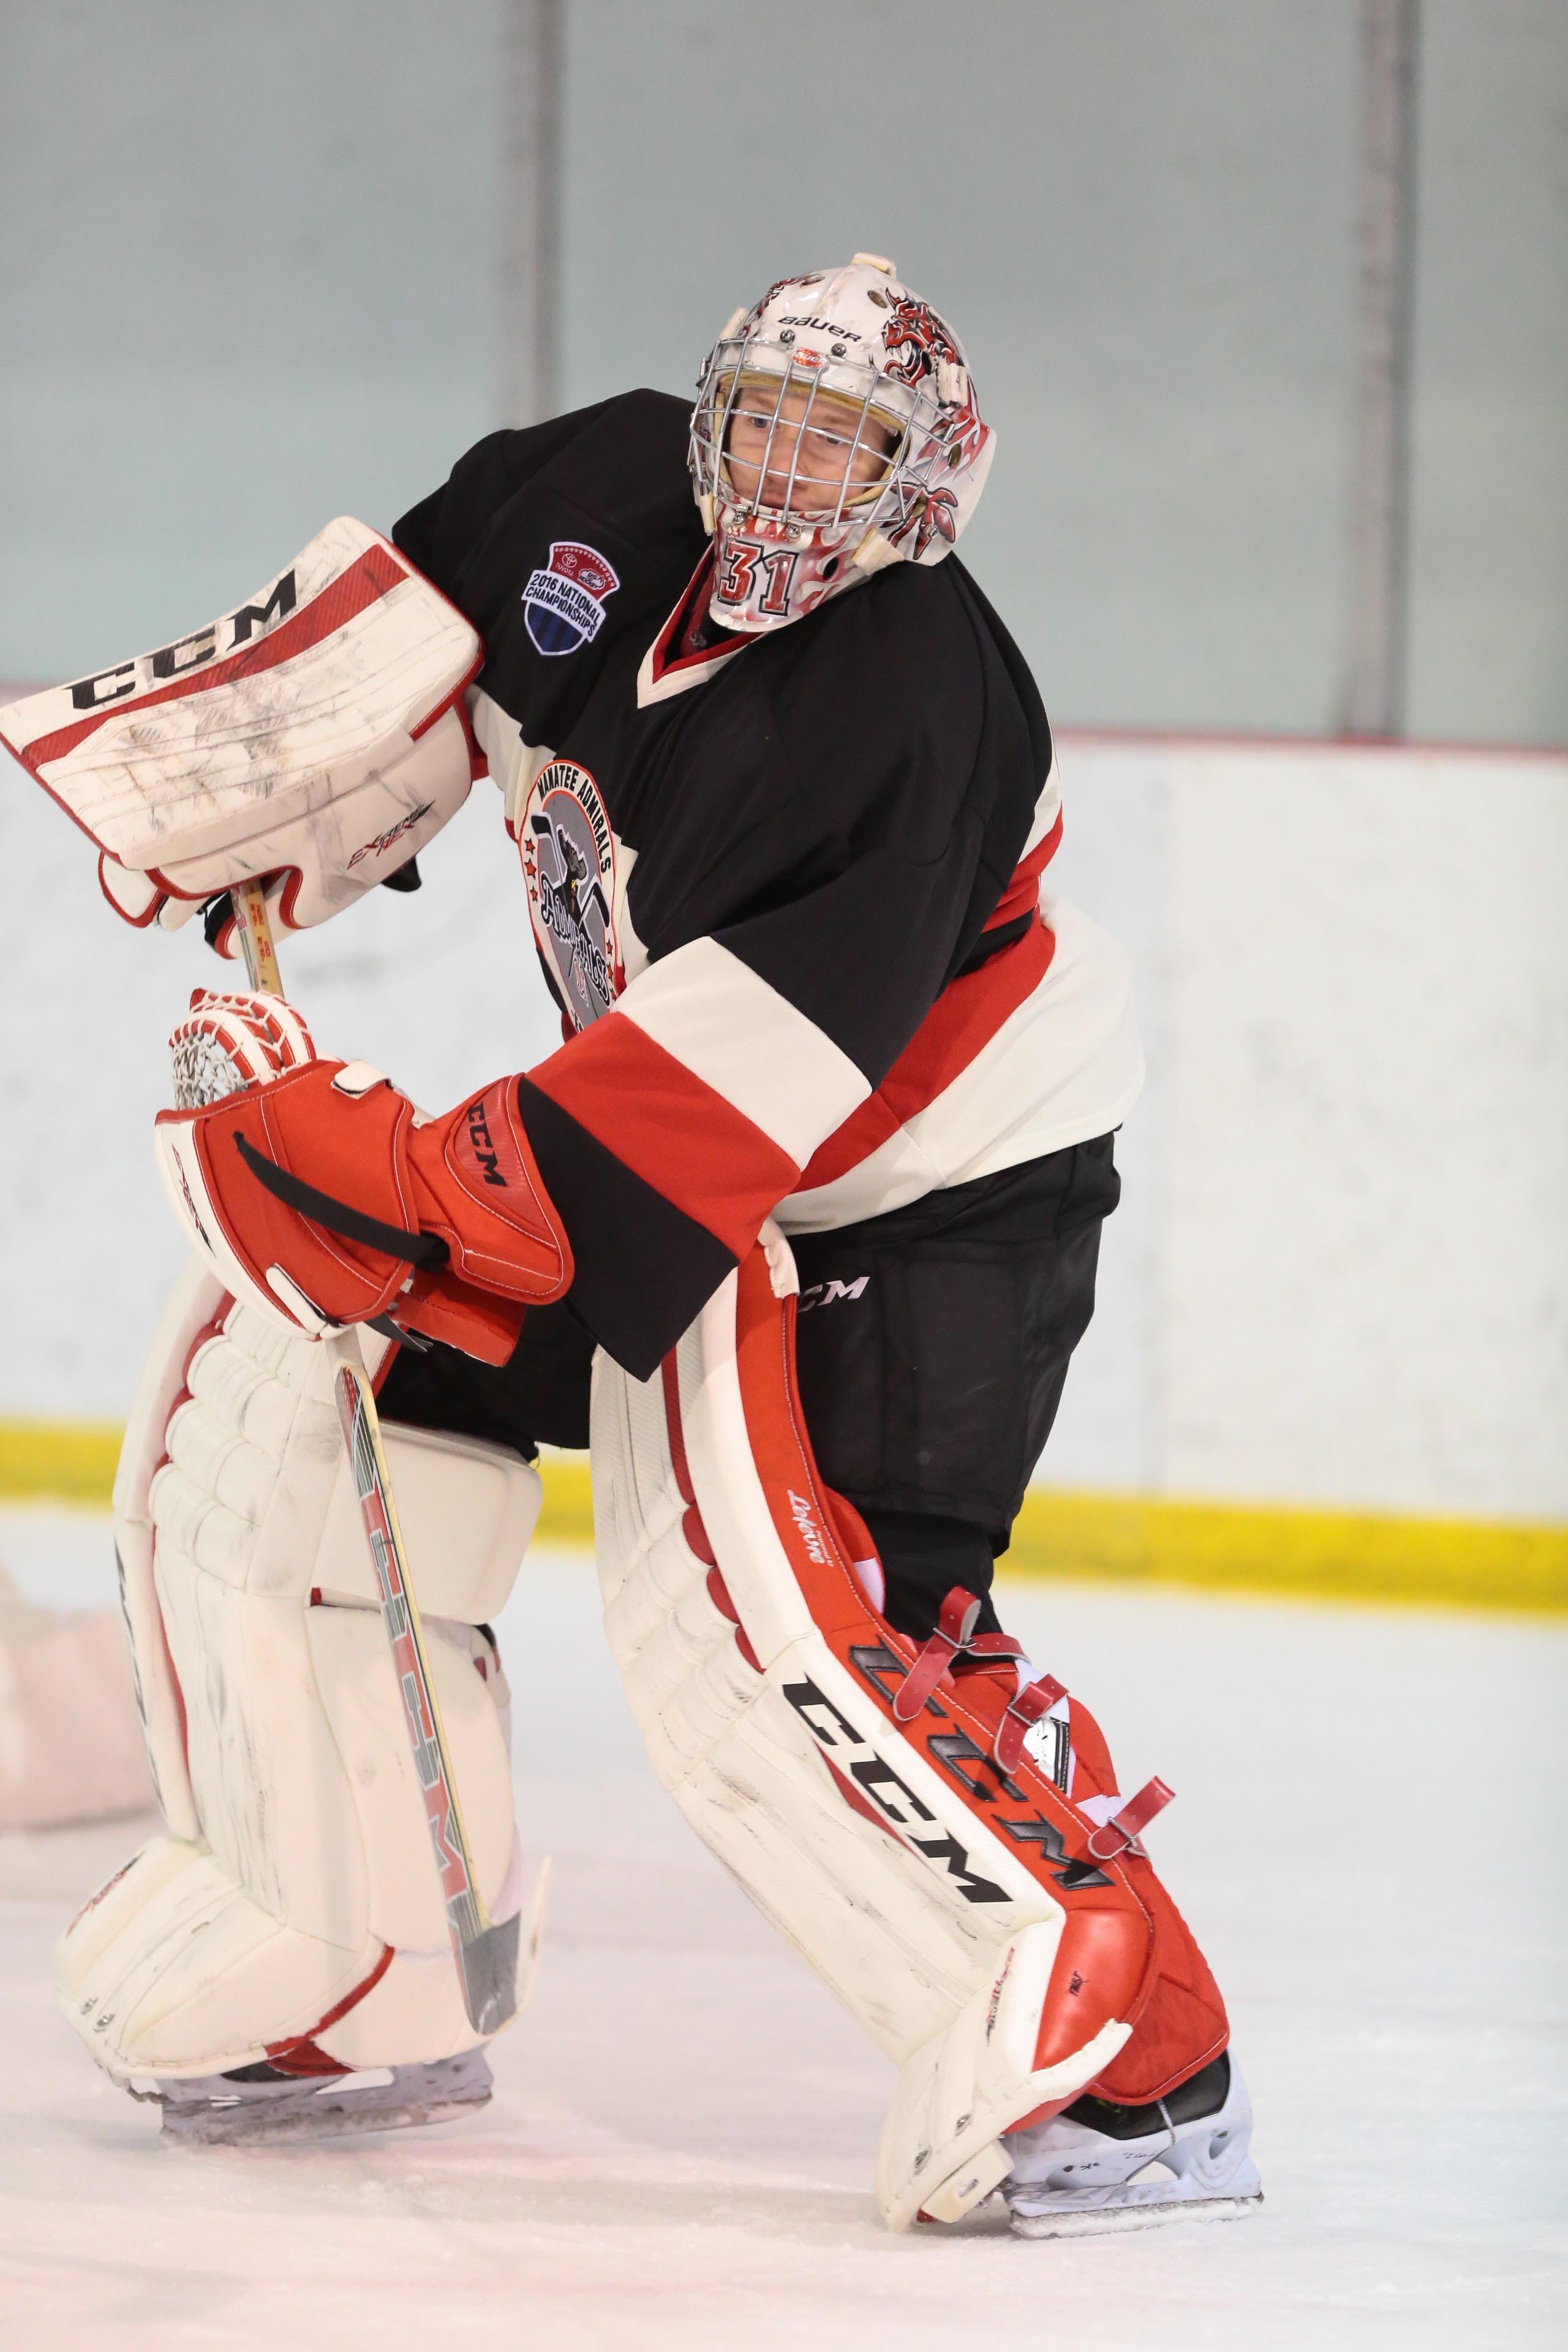 Tmej - 2016 USA Hockey Nationals